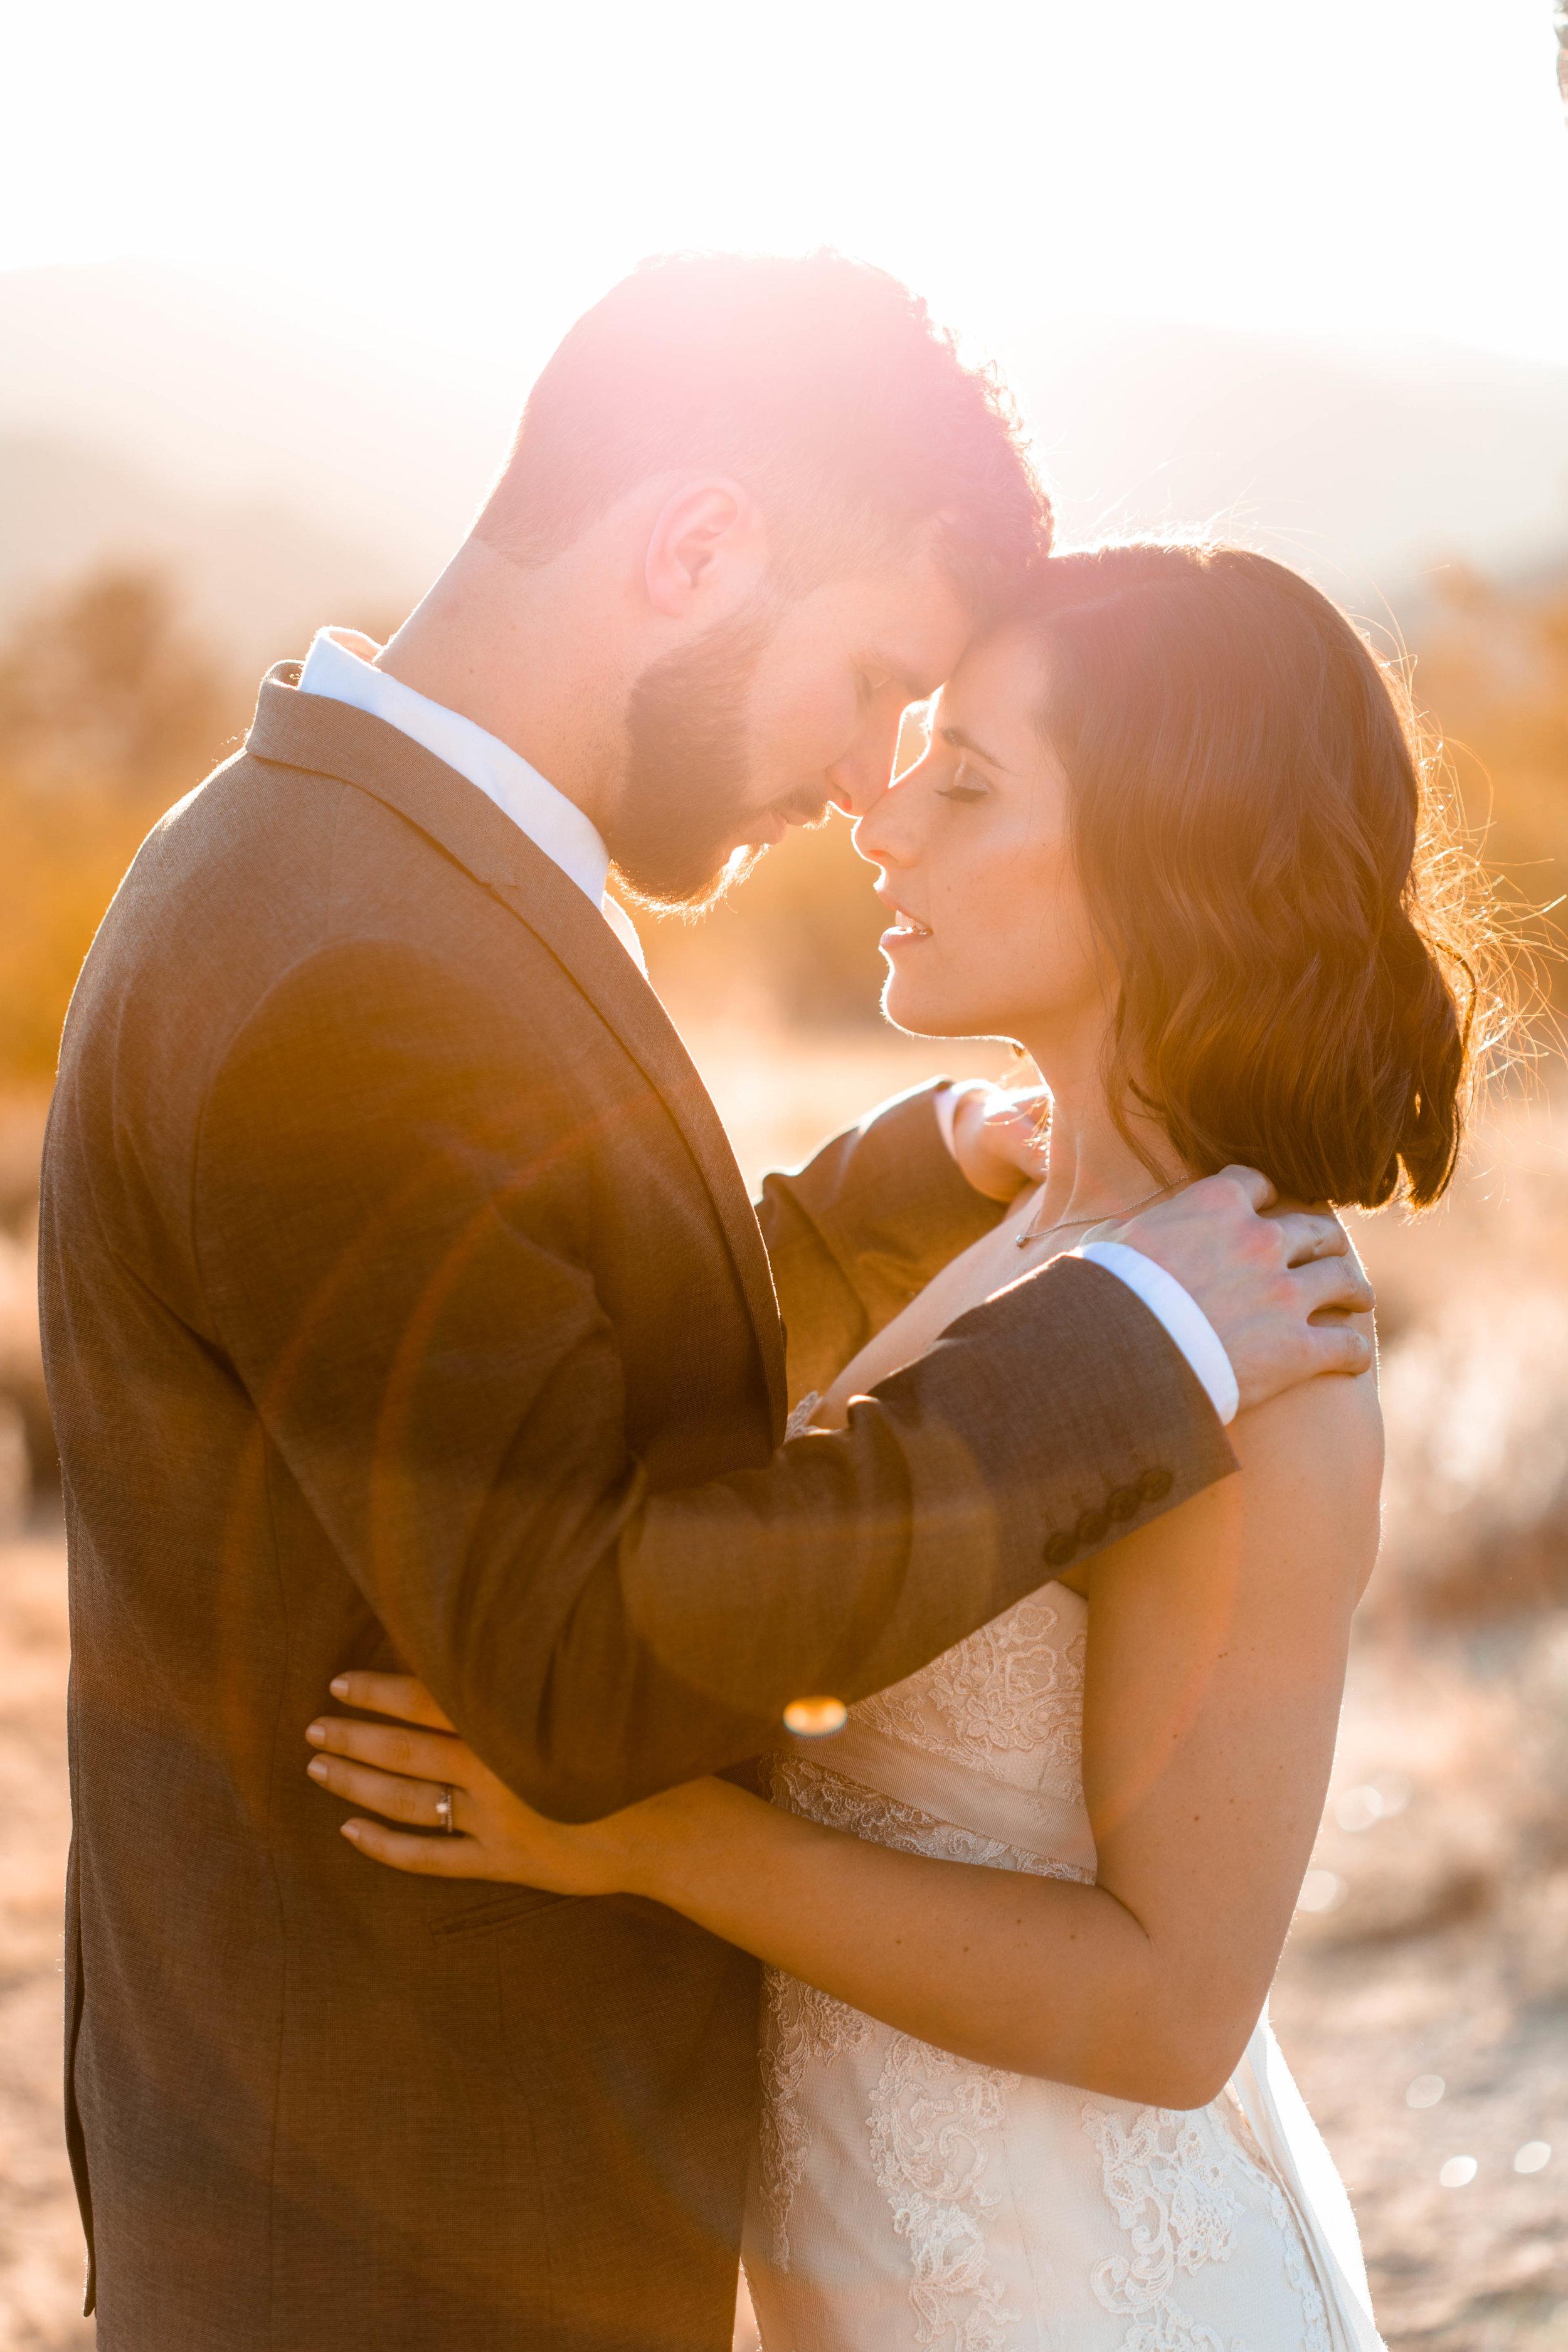 nicole-daacke-photography-joshua-tree-adventurous-elopement-wedding-national-park-wedding-photographer-adventure-wedding-adventurous-elopement-jtree-joshua-tree-national-park-wedding-photographer-intimate-weddings-golden-desert-love-2.jpg